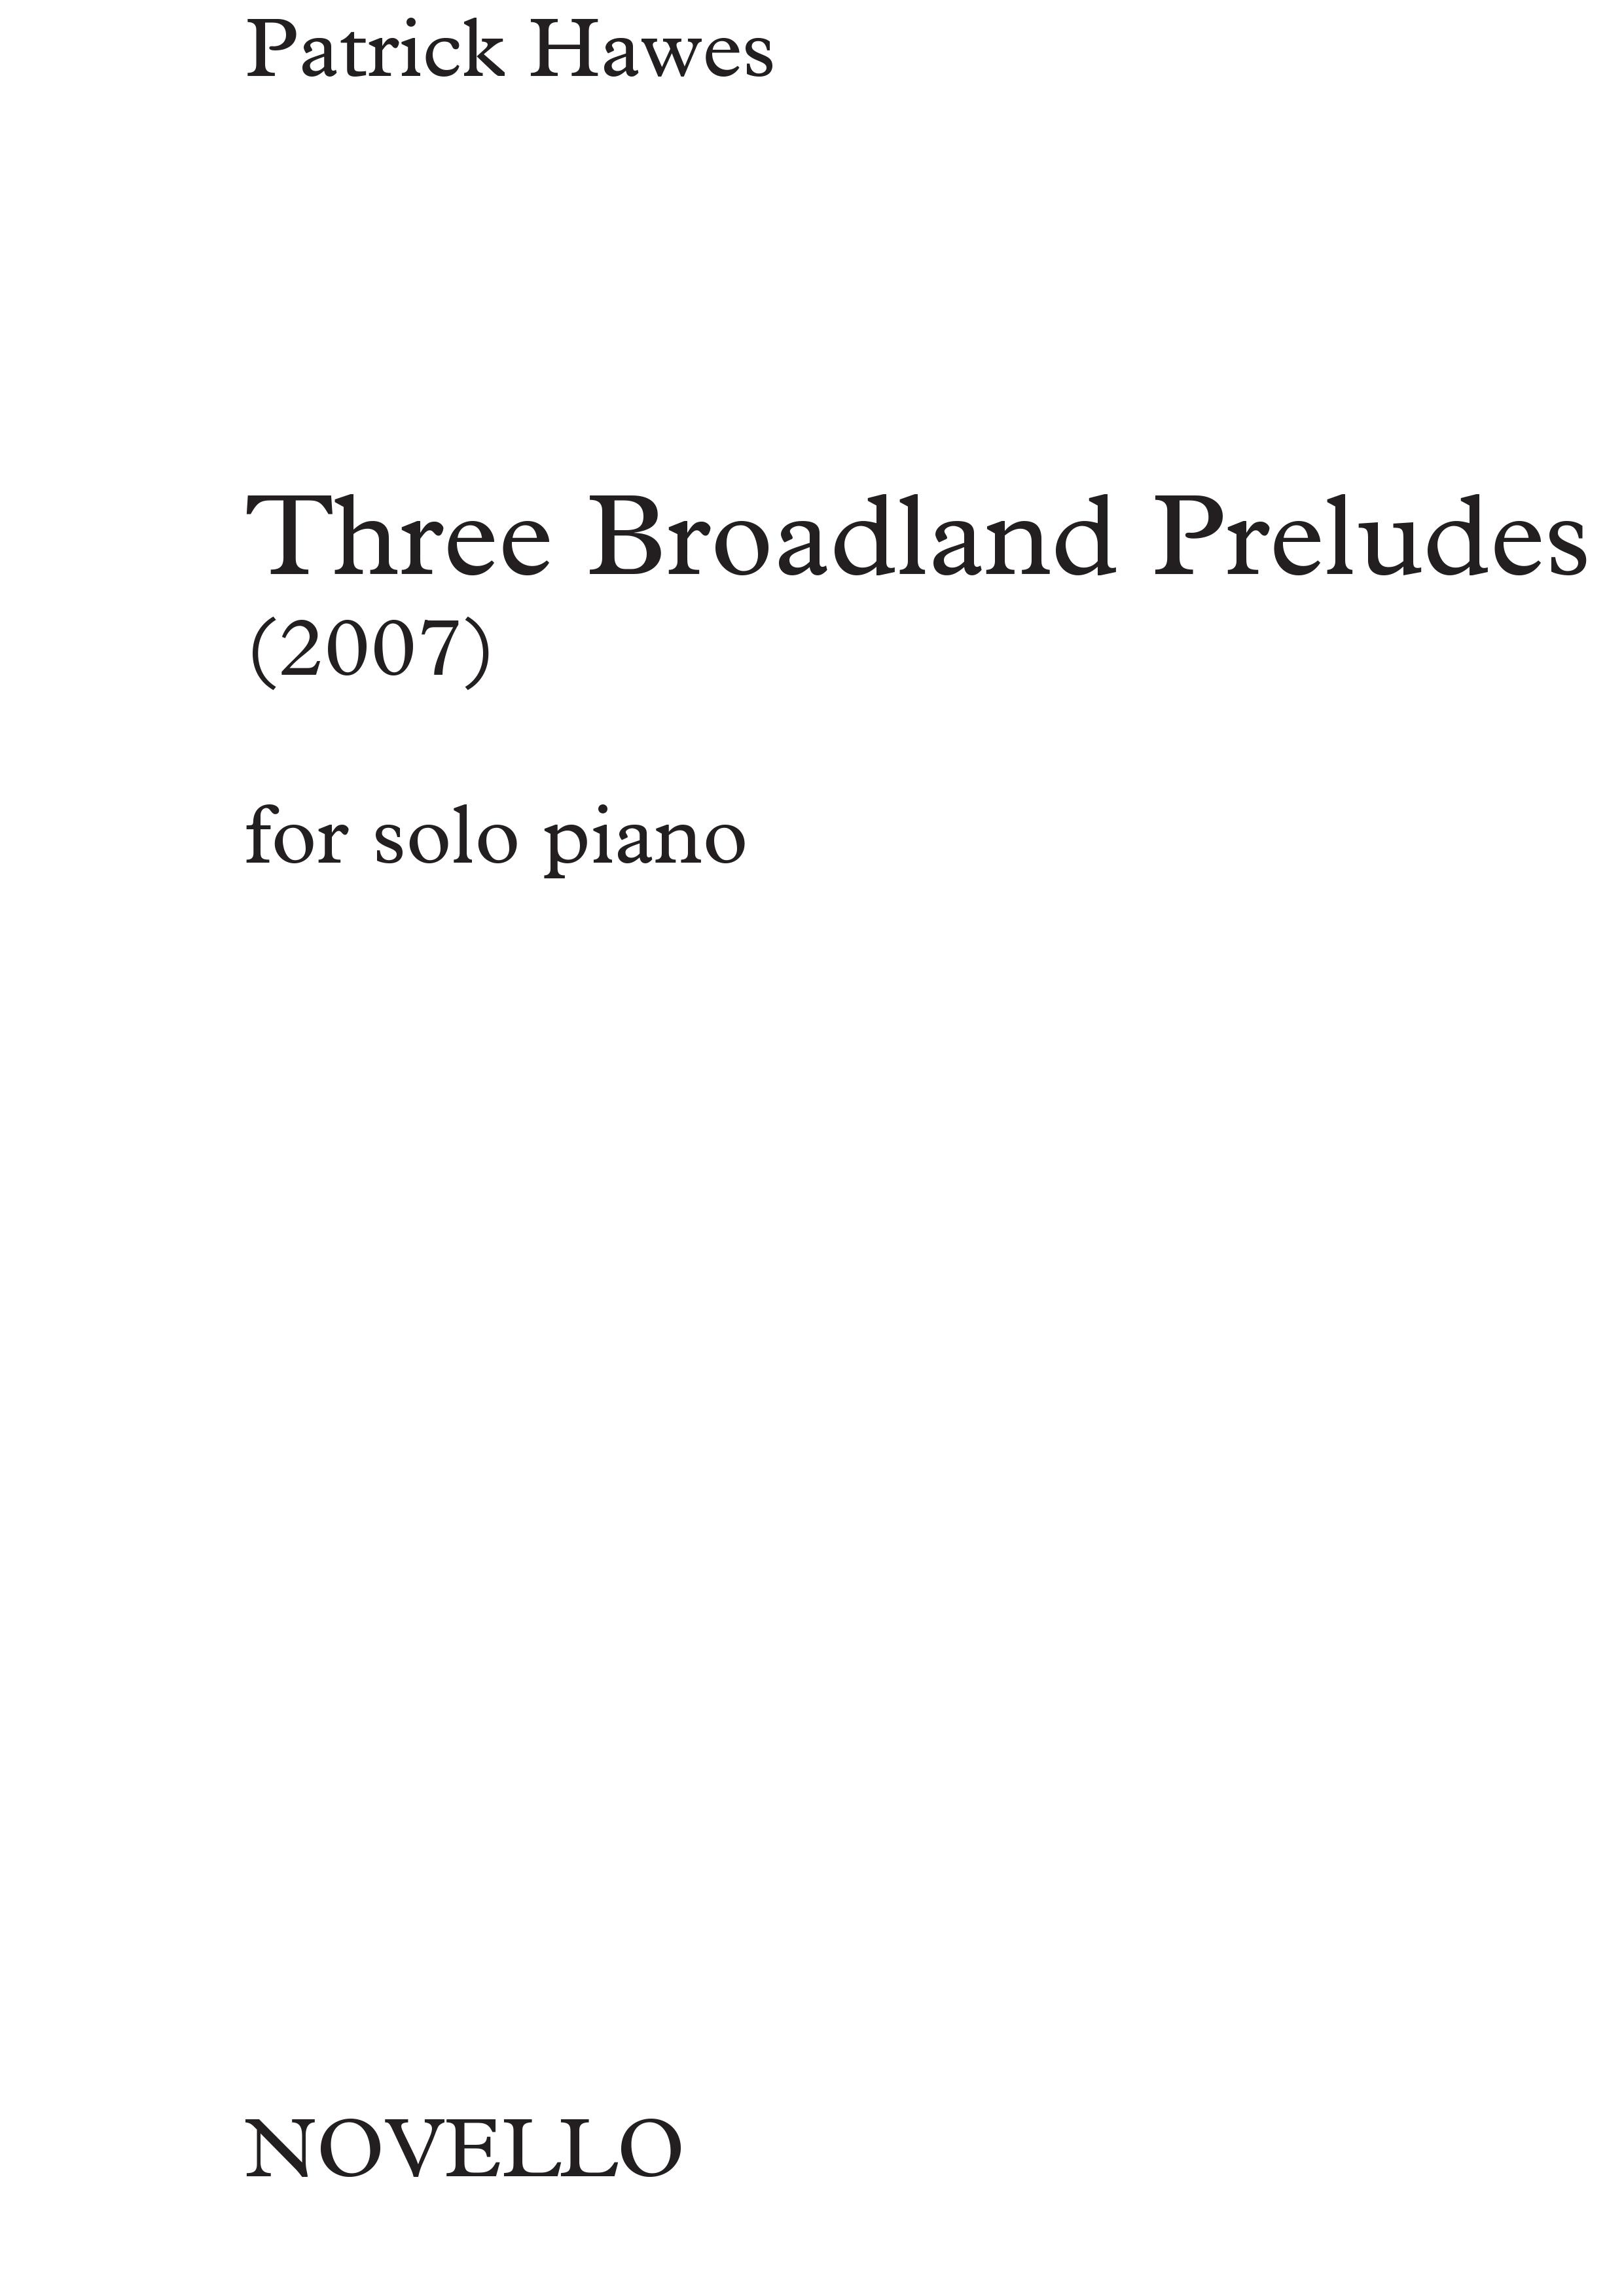 Patrick Hawes: Three Broadland Preludes: Piano: Instrumental Album